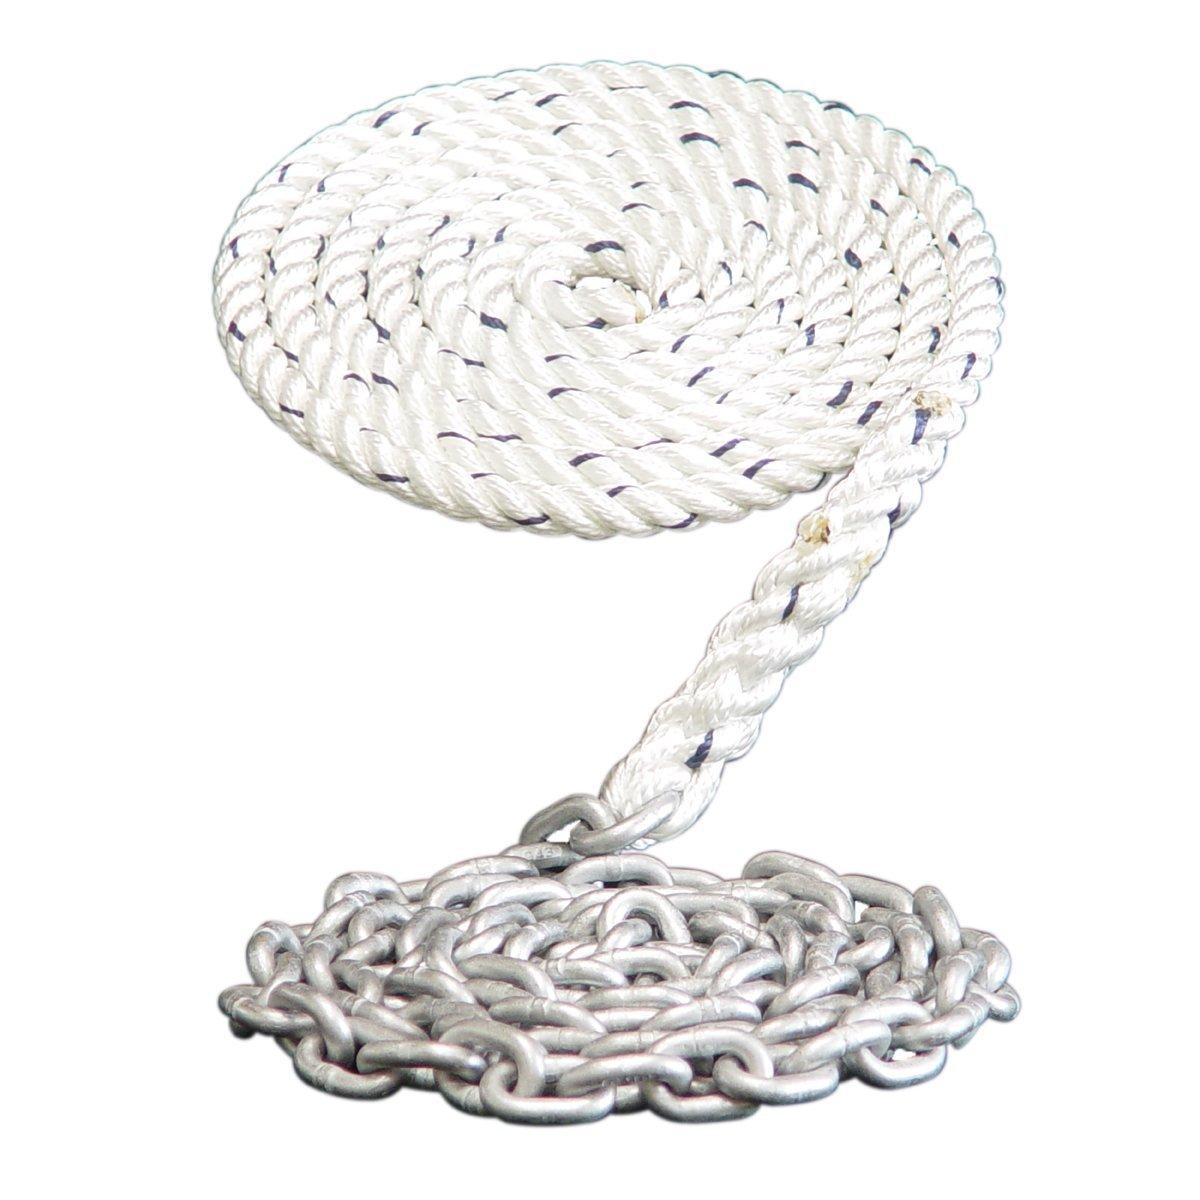 Dark Horse Marine Windlass Anchor Rode 400 9//16 3 Strand Nylon Spliced to 15-5//16 Galvanized Chain